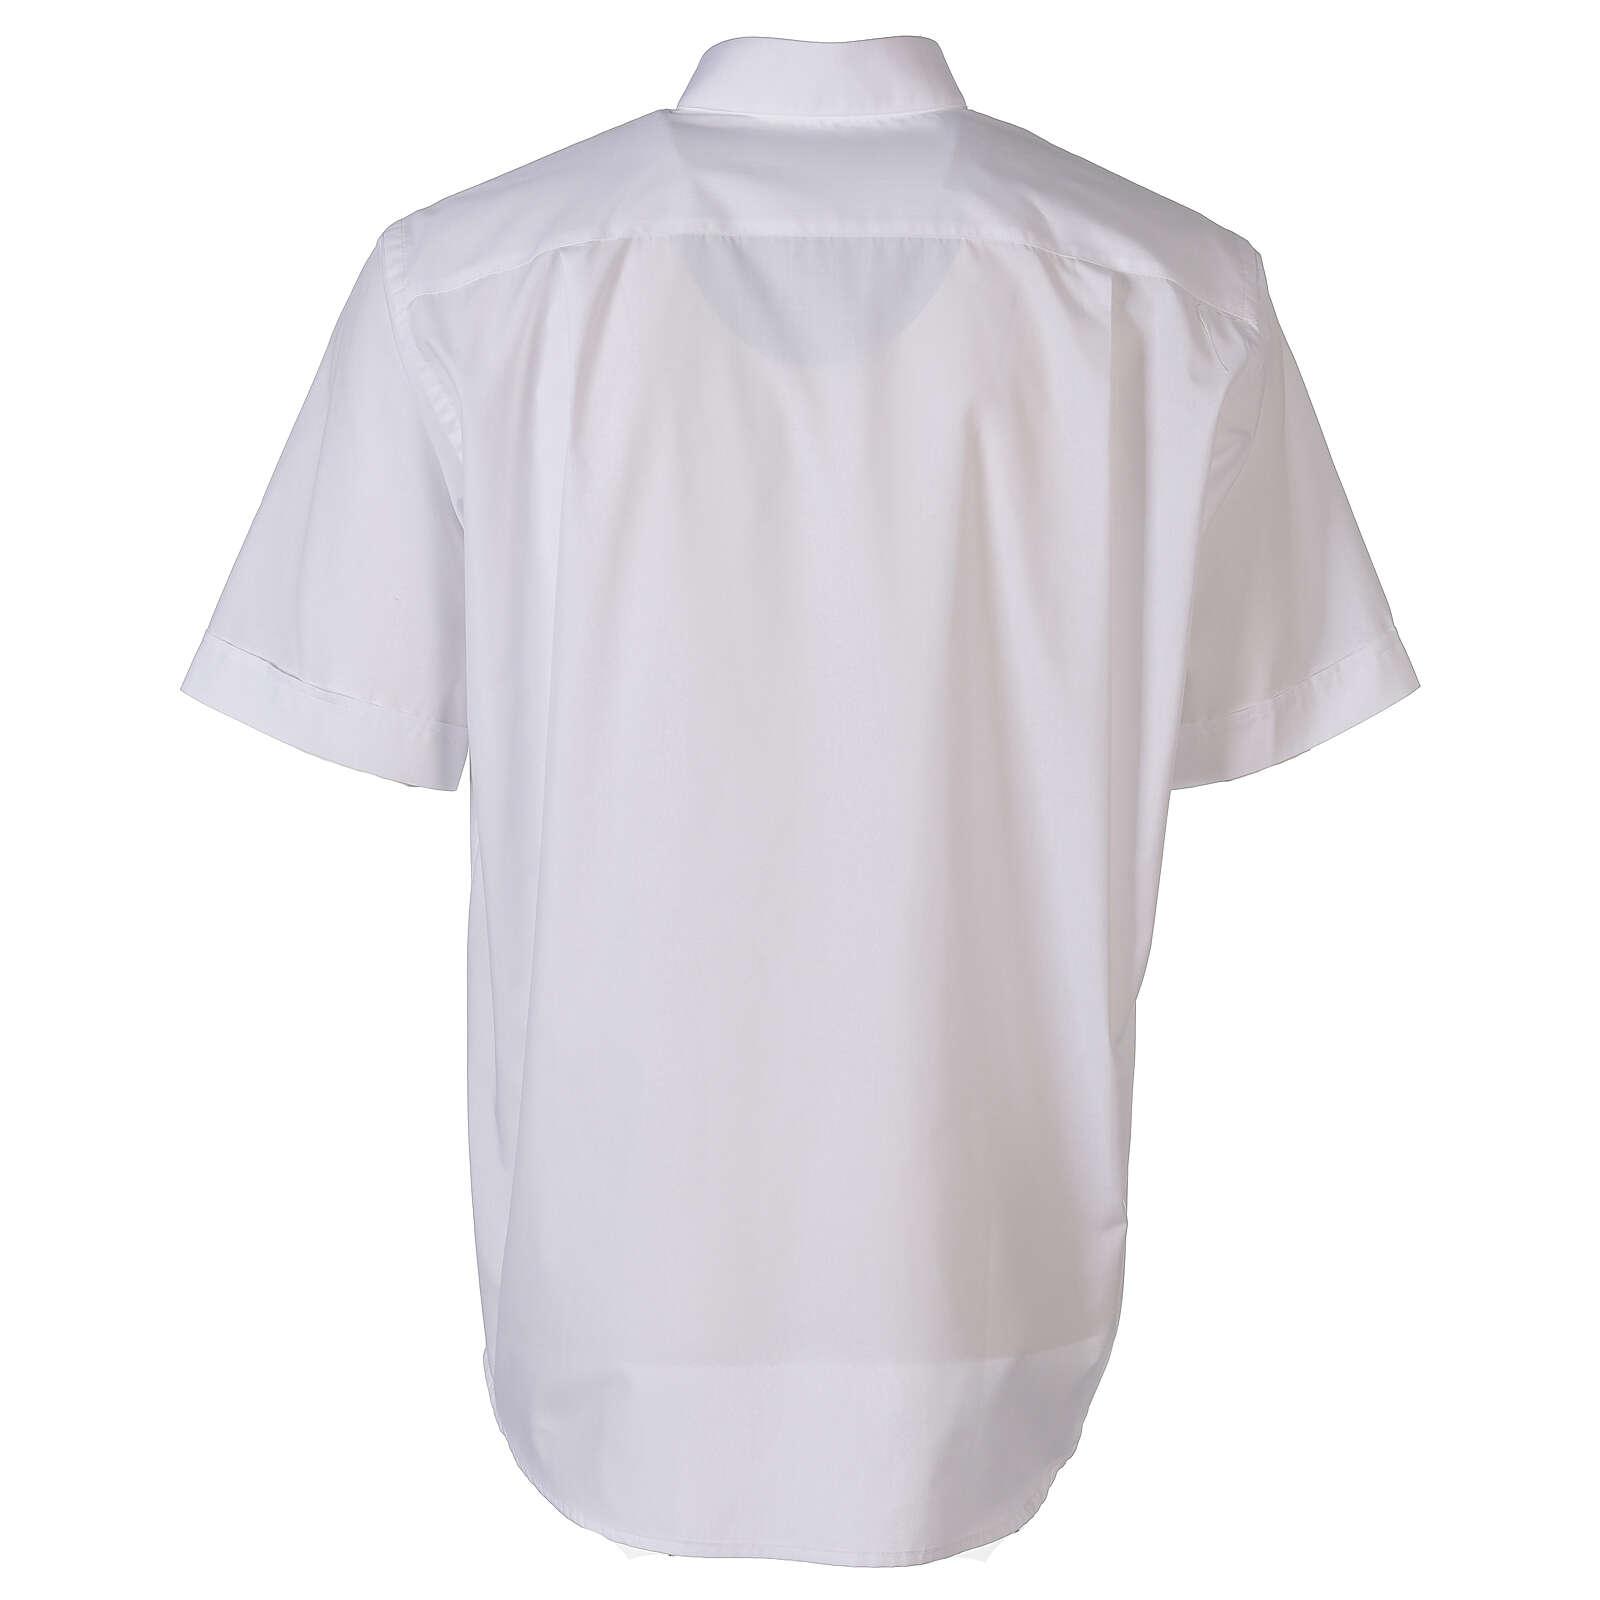 Camisa para sacerdote branca unicolor mangas curtas 4